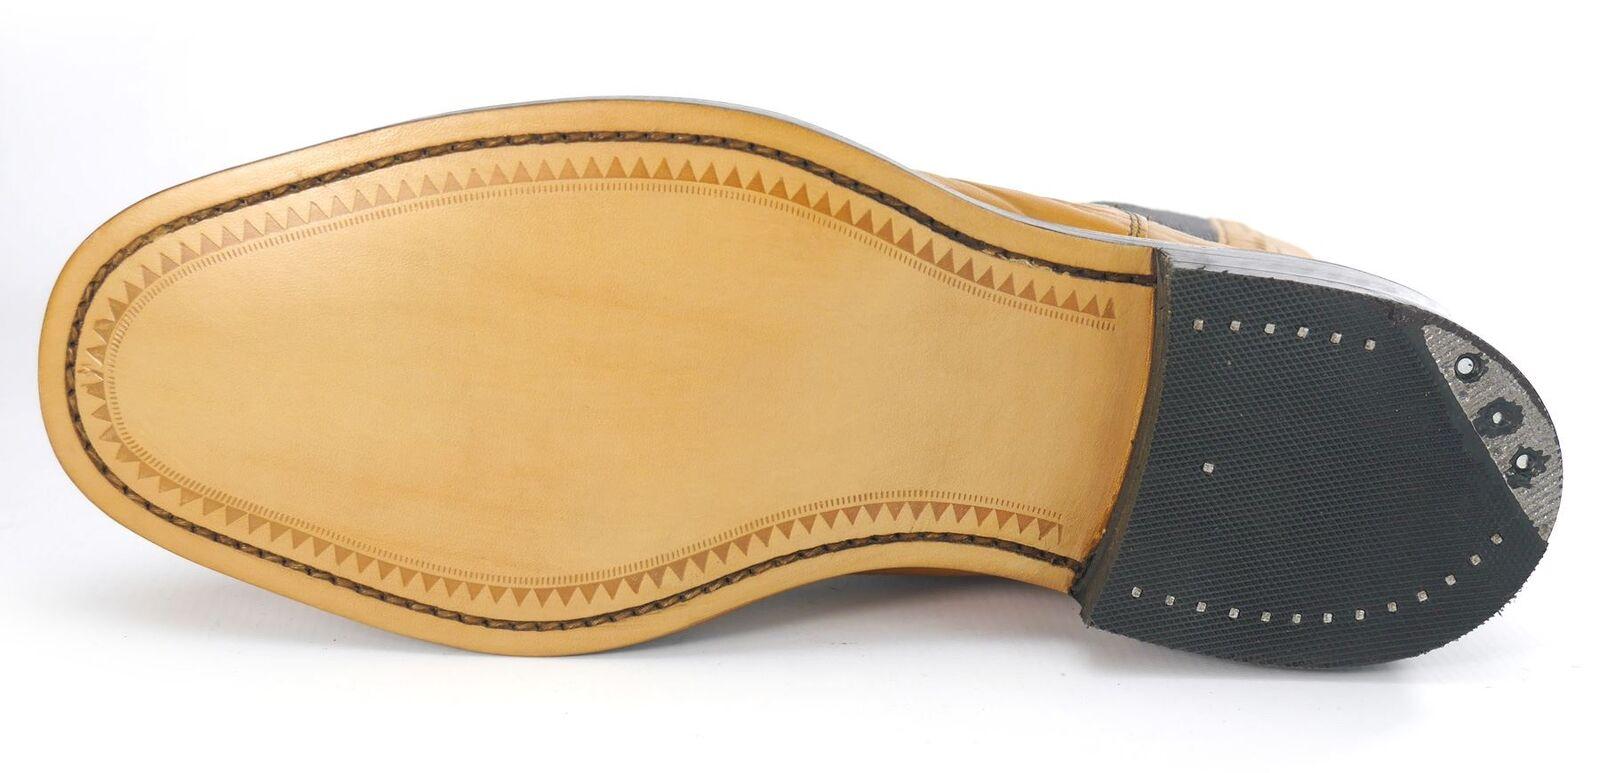 Charles Horrel Horrel Horrel Made in England alato CALATA CHELSEA suola in pelle Mustang Tan f053b6